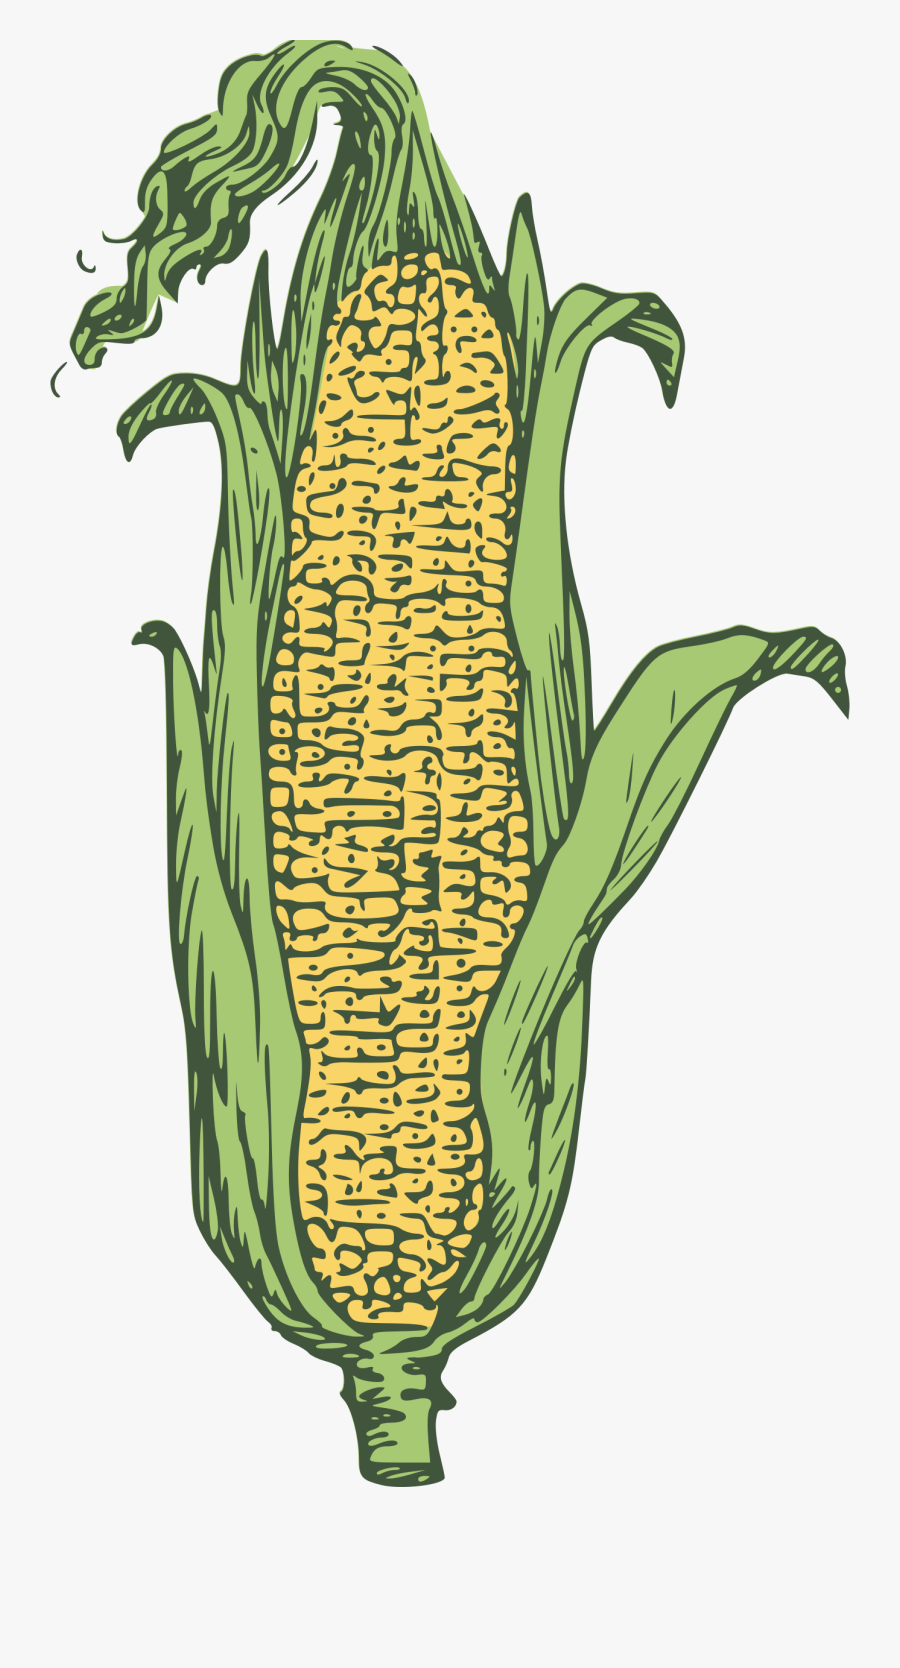 Ear Of Corn Clipart - Ear Maize, Transparent Clipart